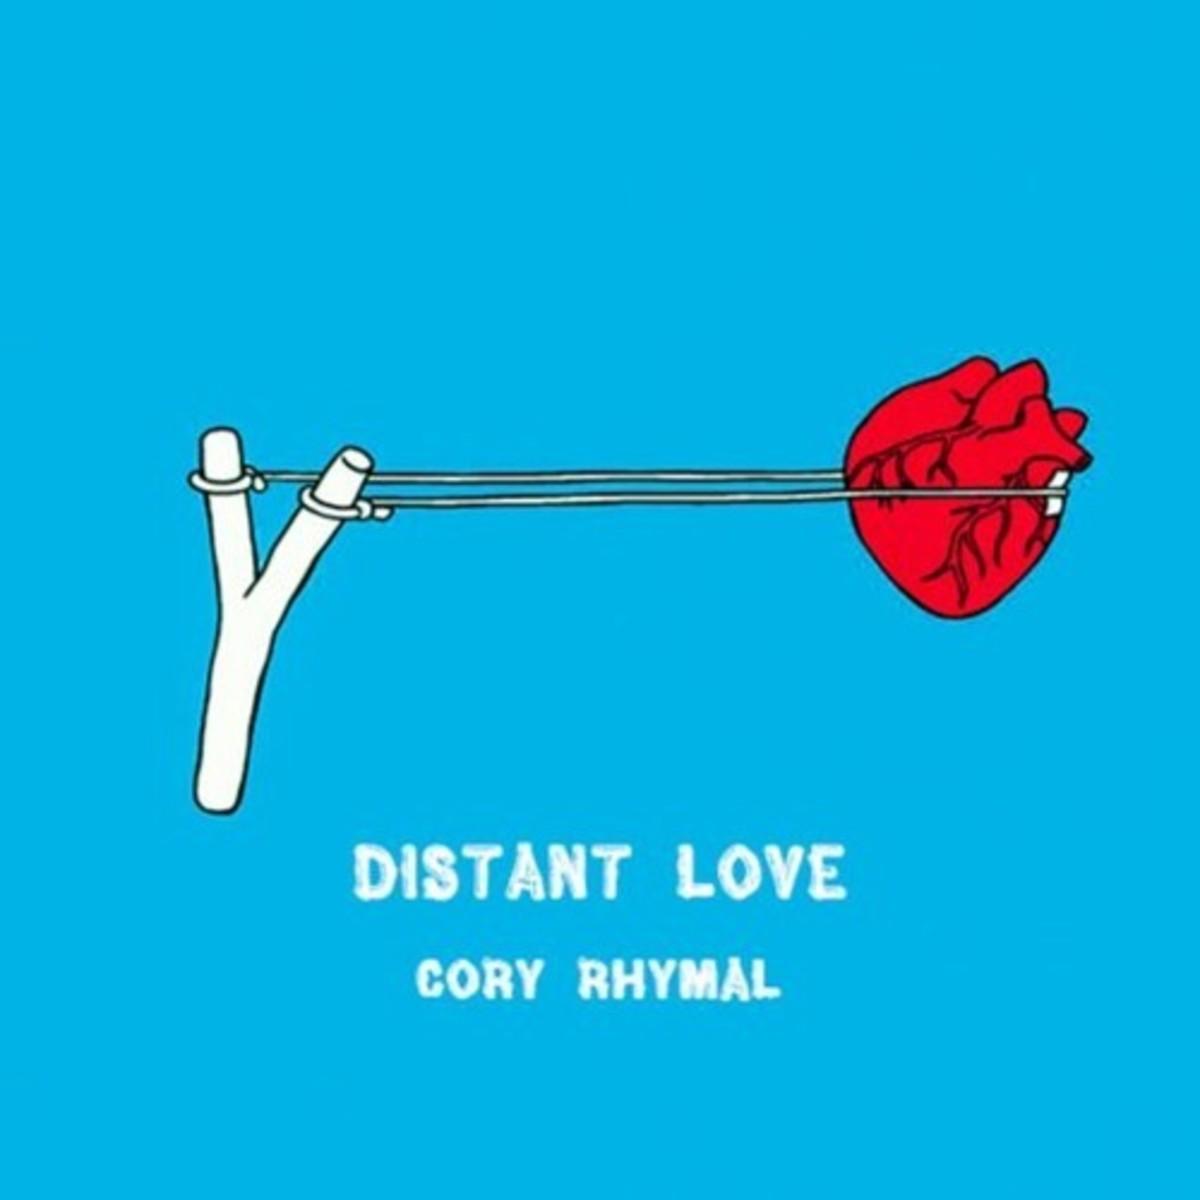 cory-rhymal-distant-love.jpg